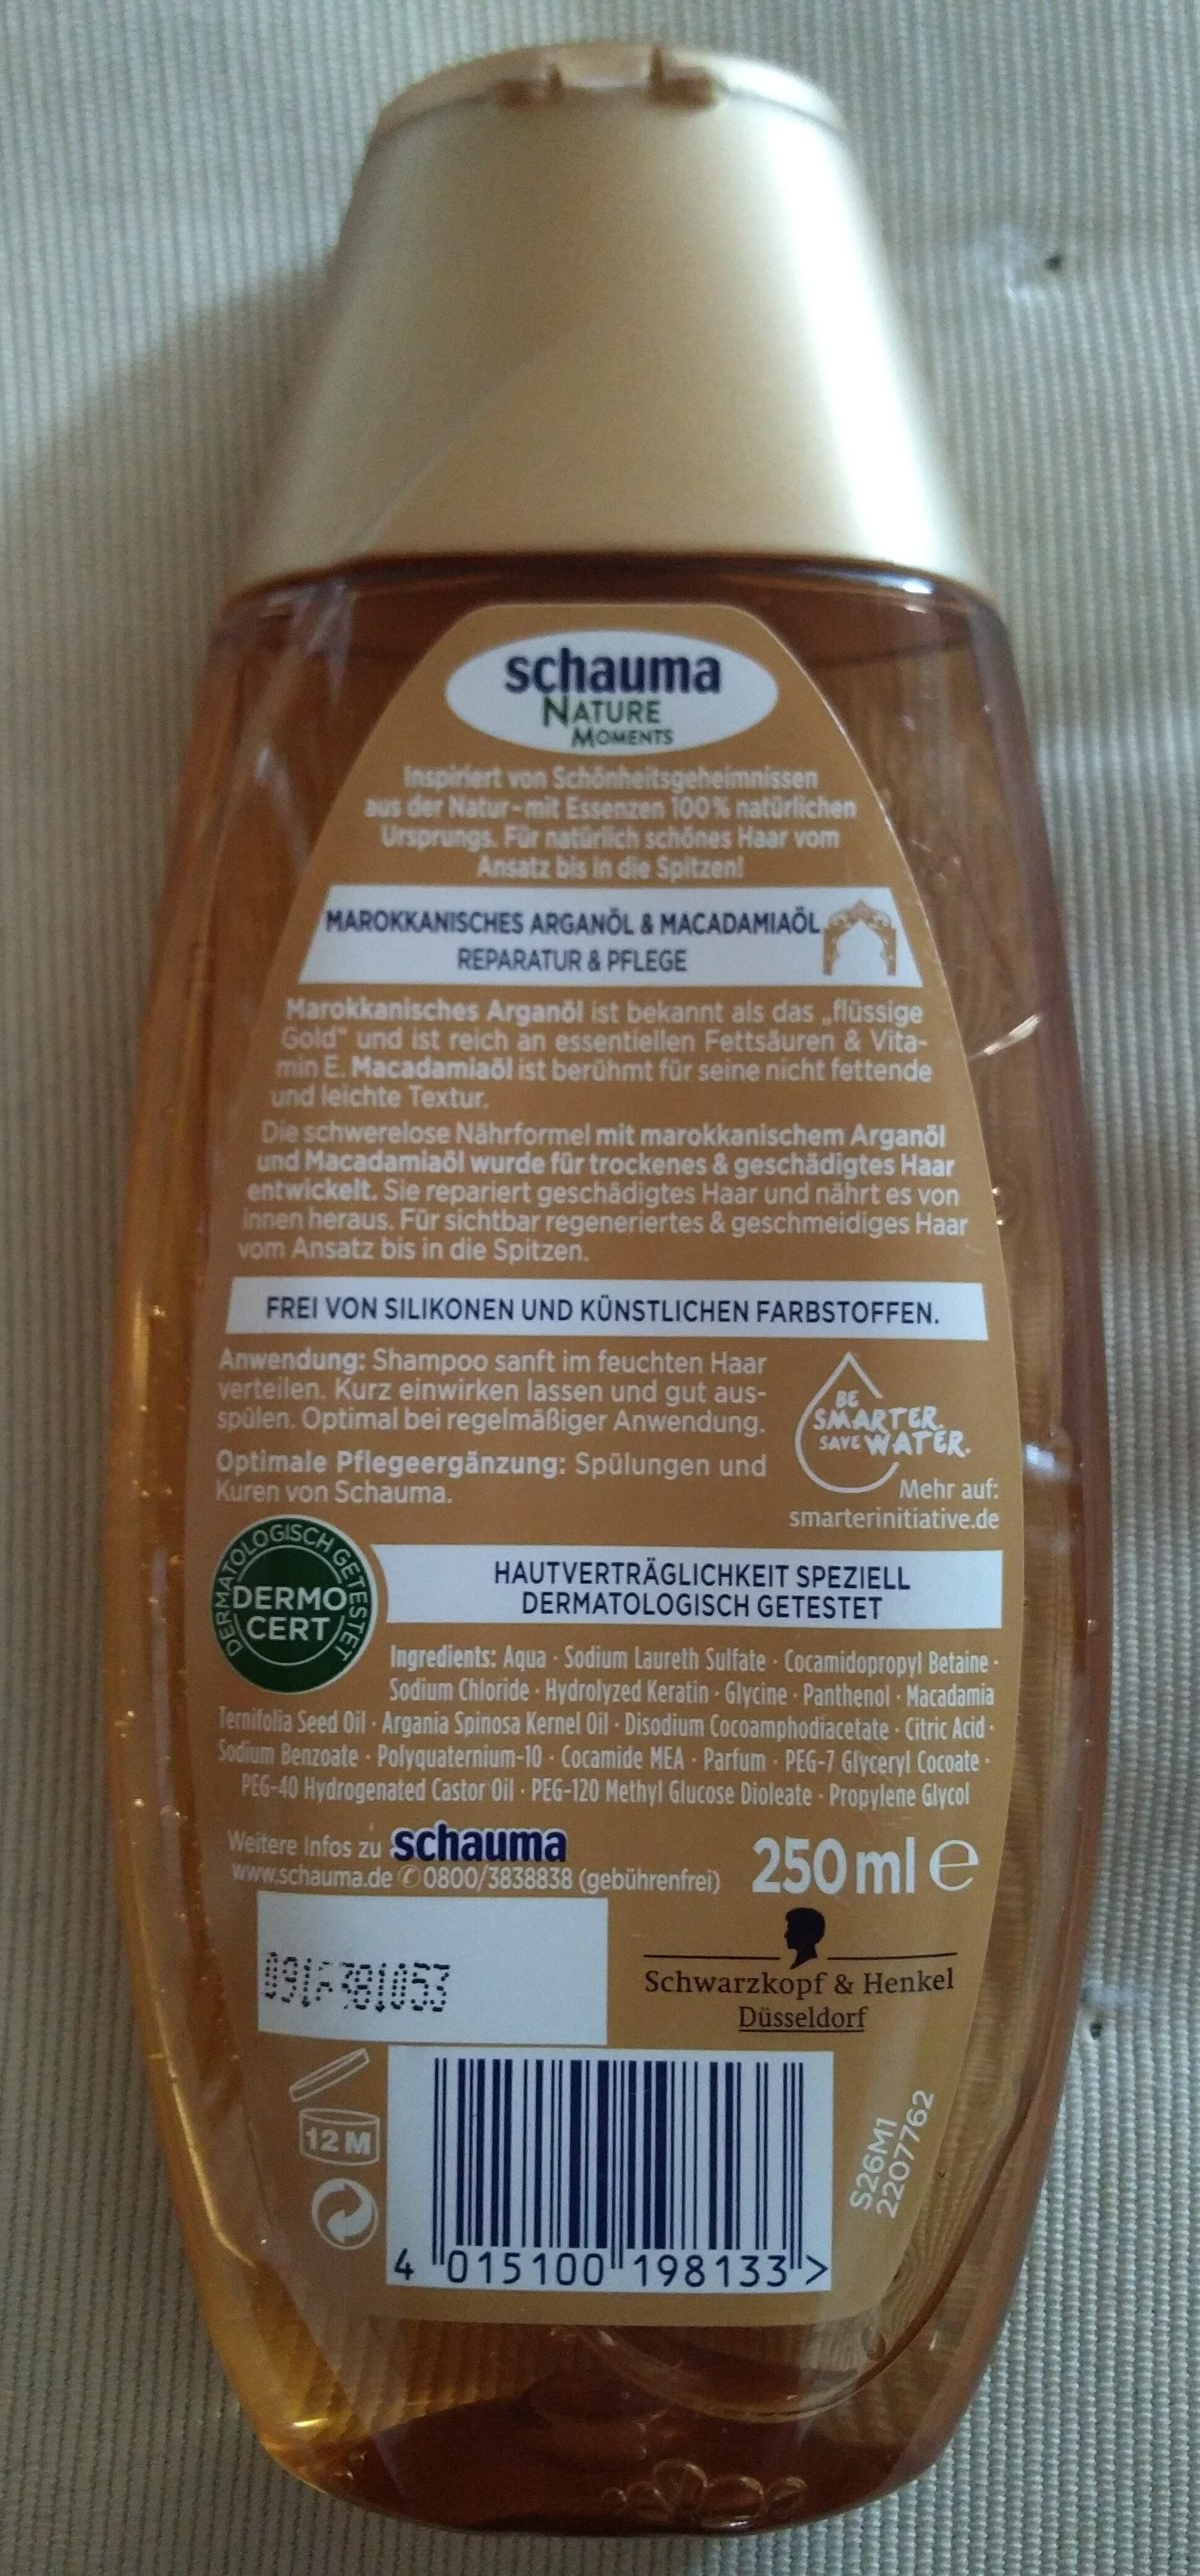 Nature Moments - Shampoo (Marokkanisches Arganöl & Macadamiaöl) - Product - en